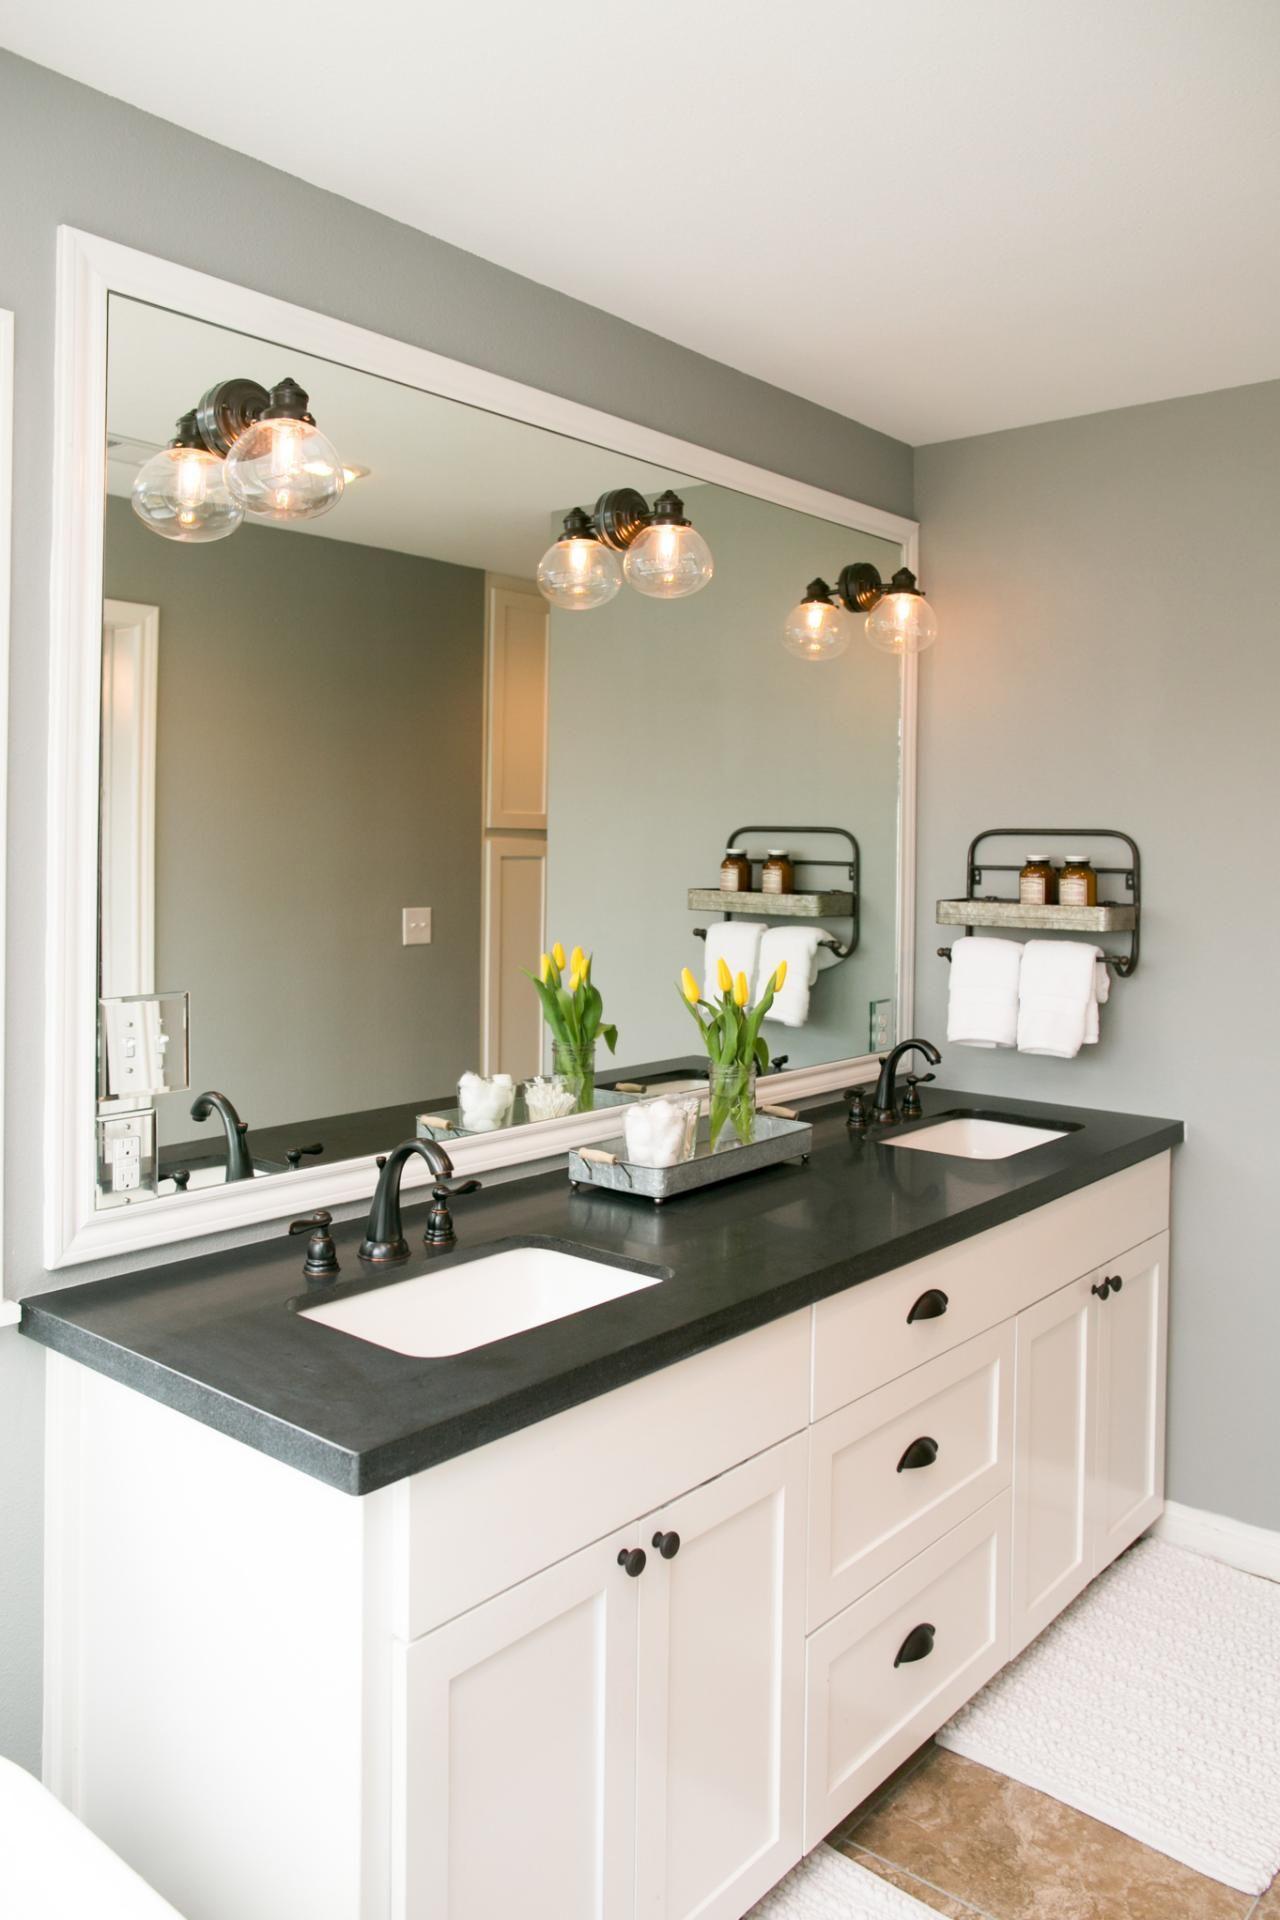 The Master Bathroom Has Black Granite Countertops With